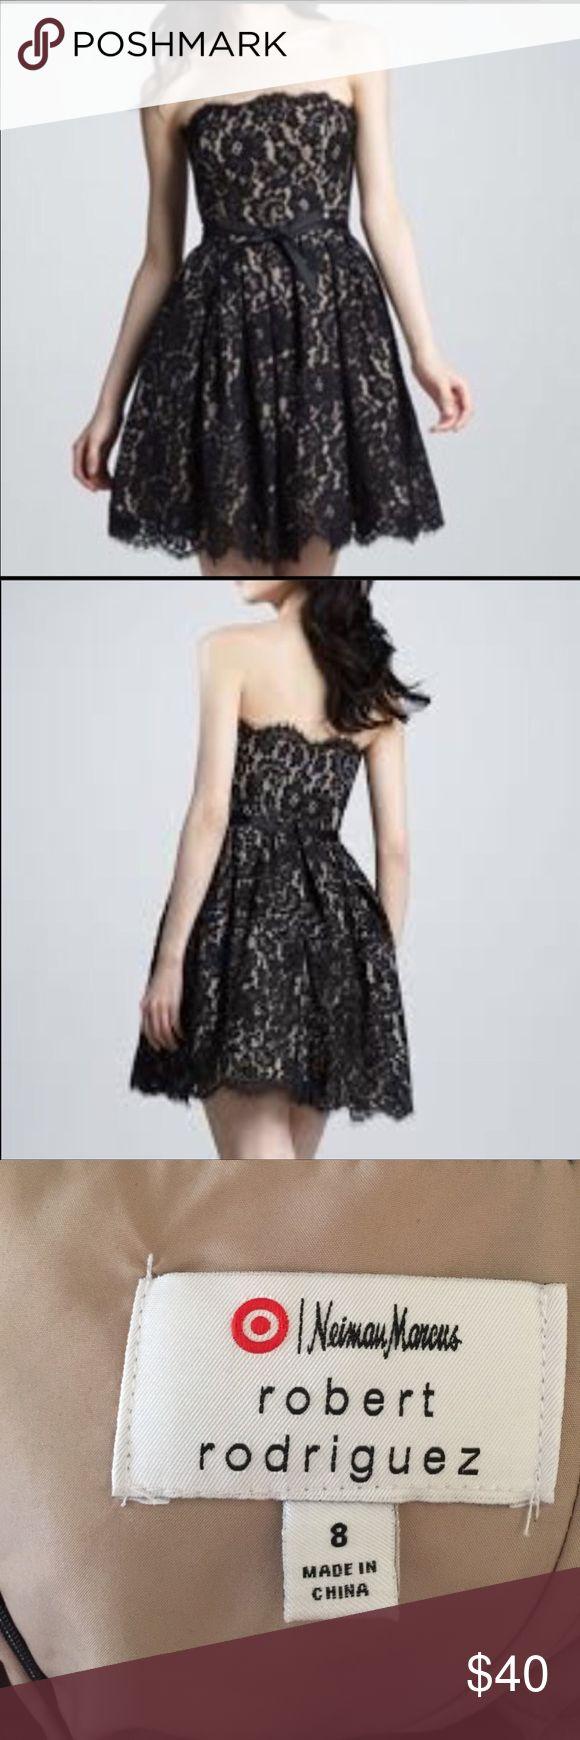 Neiman Marcus Black Chantilly lace dress Neiman Marcus Black Chantilly lace dress.  Worn one time. Neiman Marcus Dresses Mini